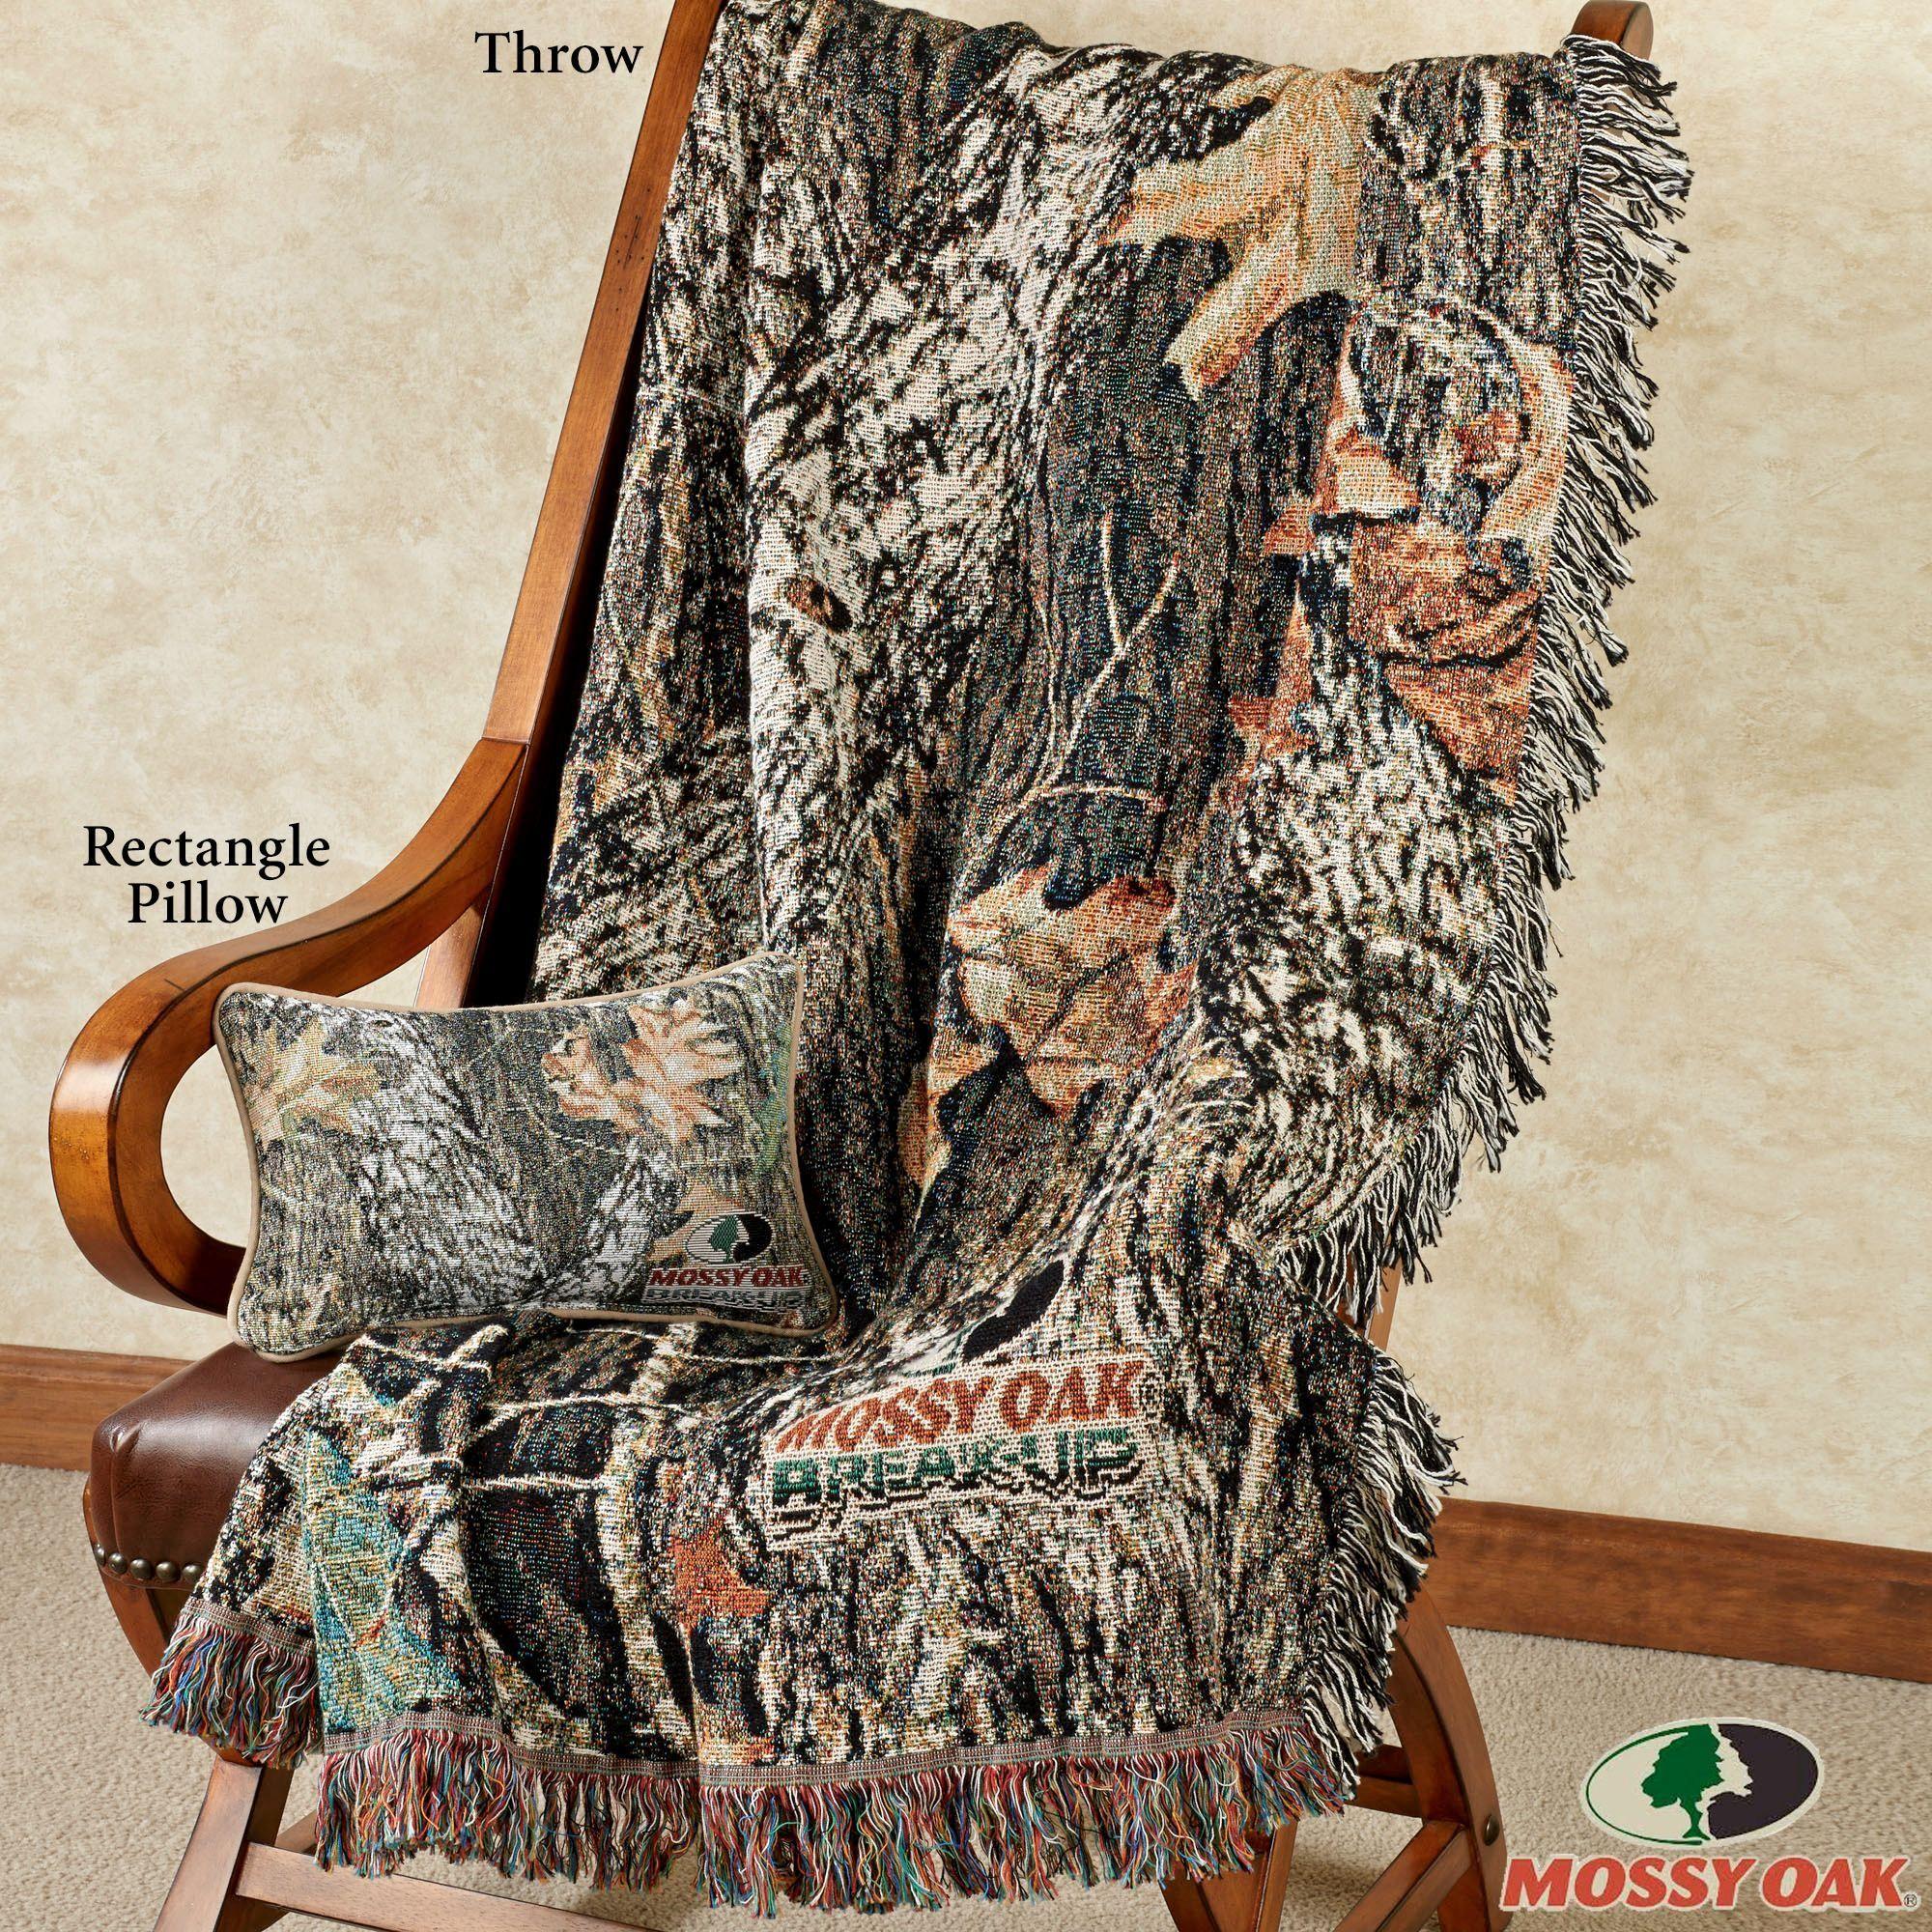 Mossy Oak Break Up Infinity Camo Throw Blanket or Pillow #howtodisguiseyourself